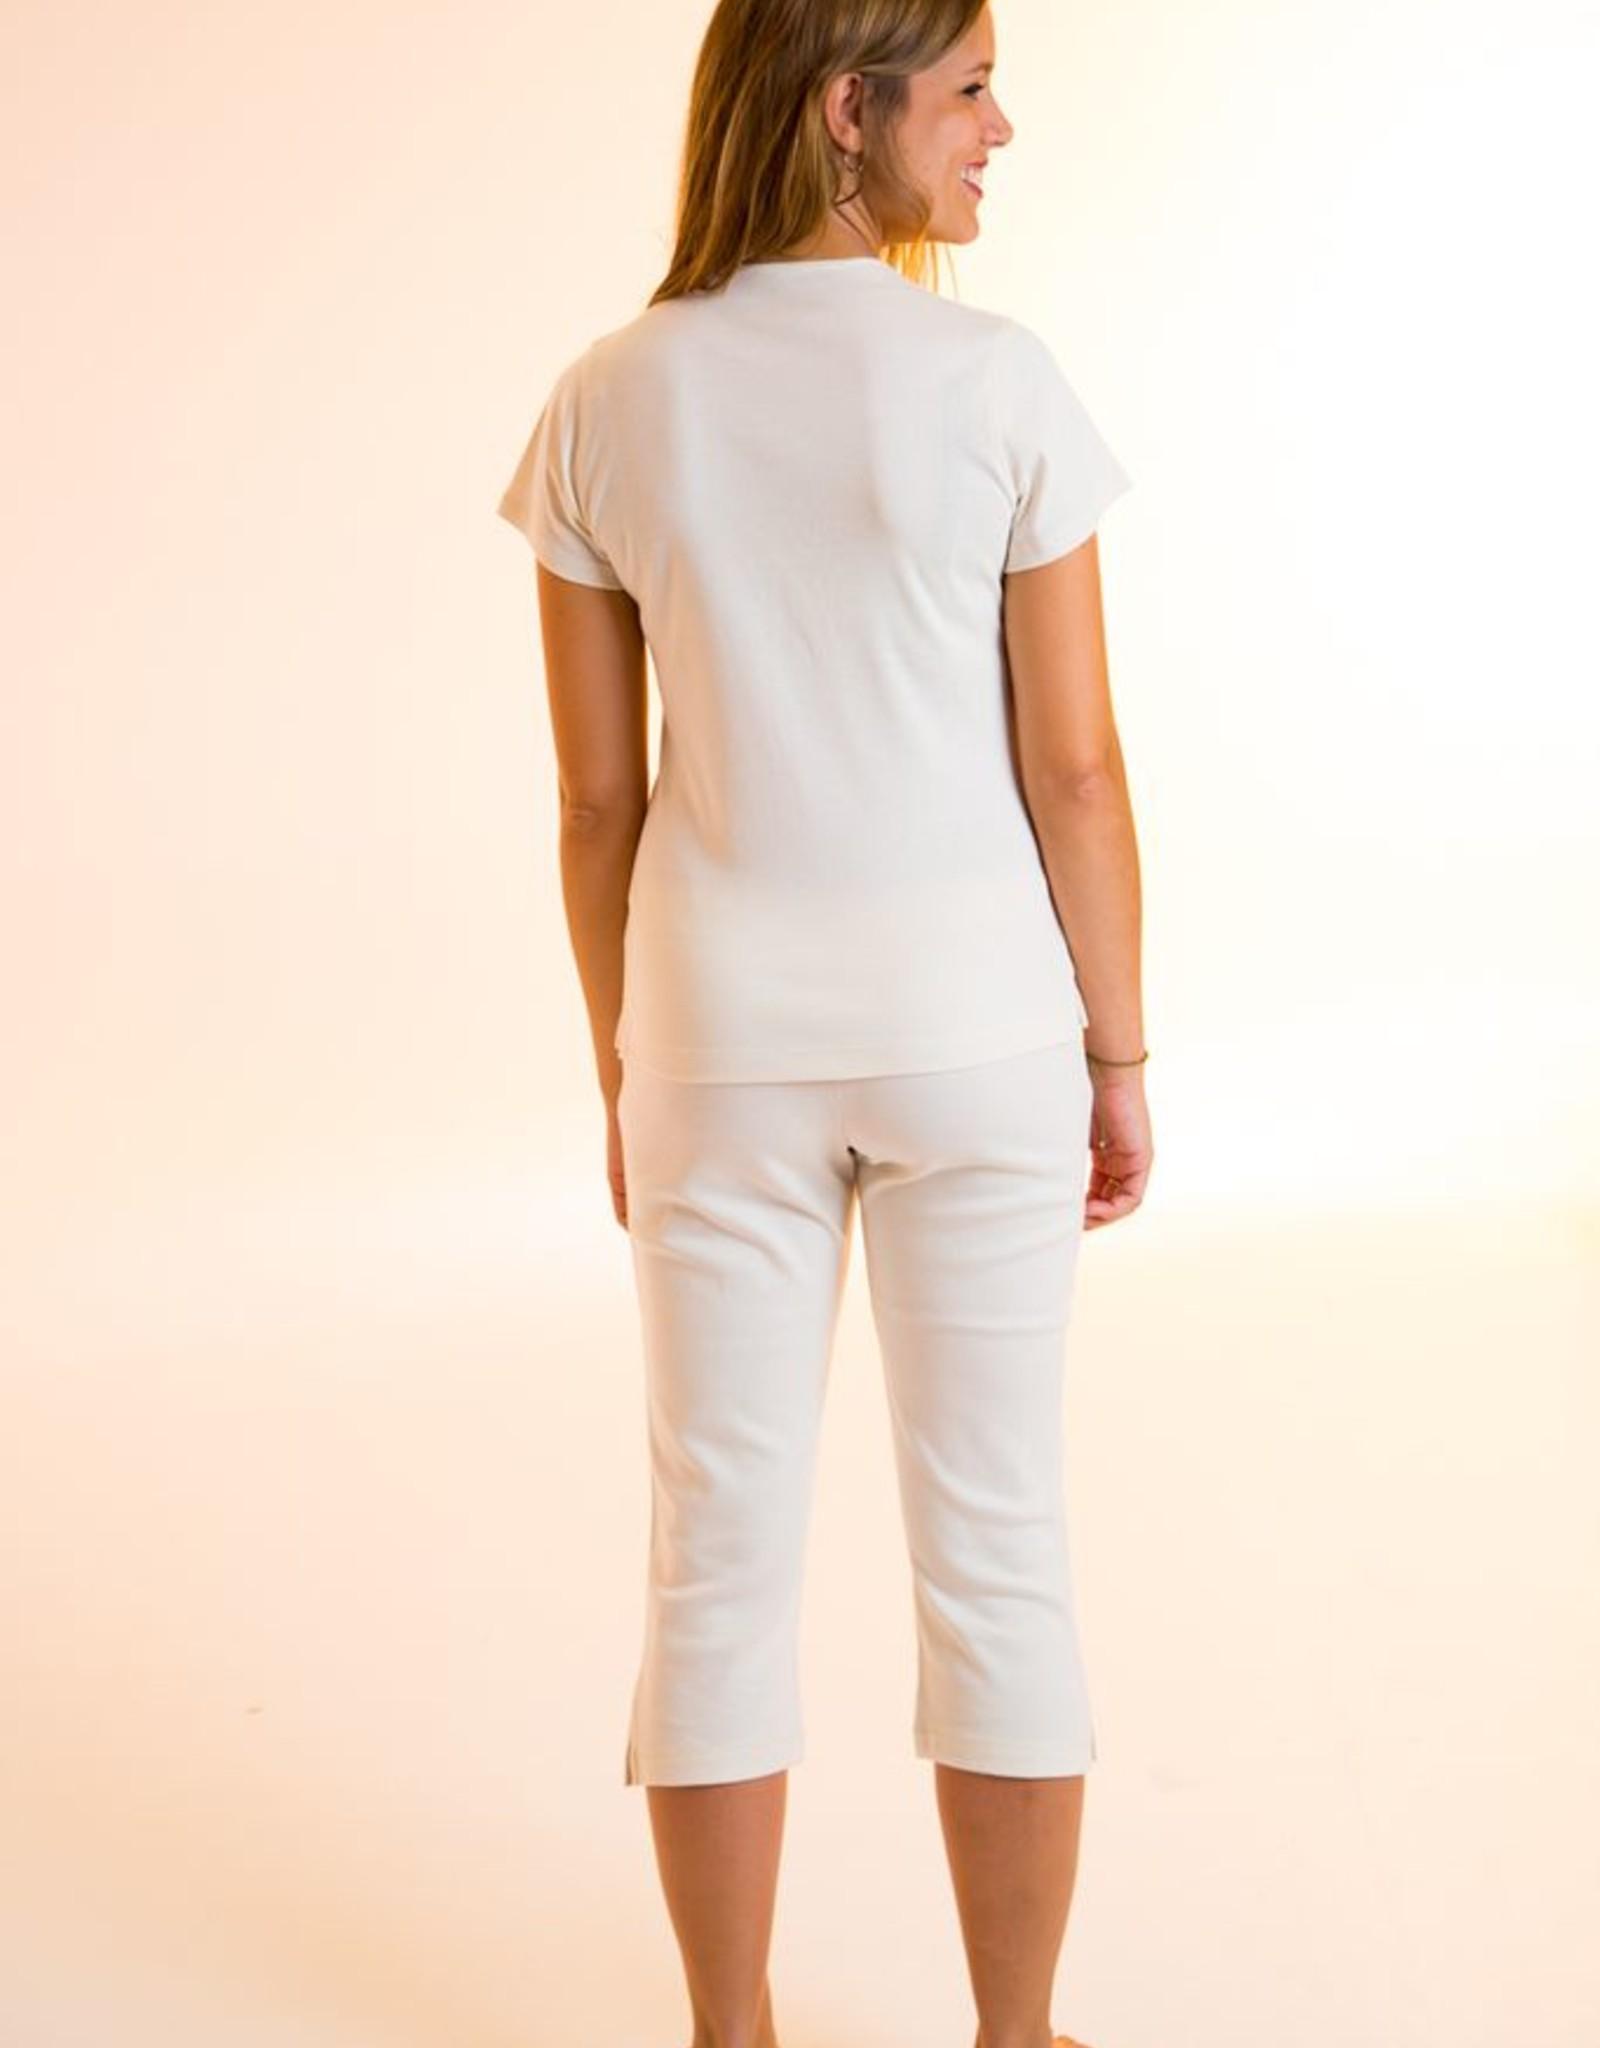 Camiseta mujer con cuello redondo y manga corta.